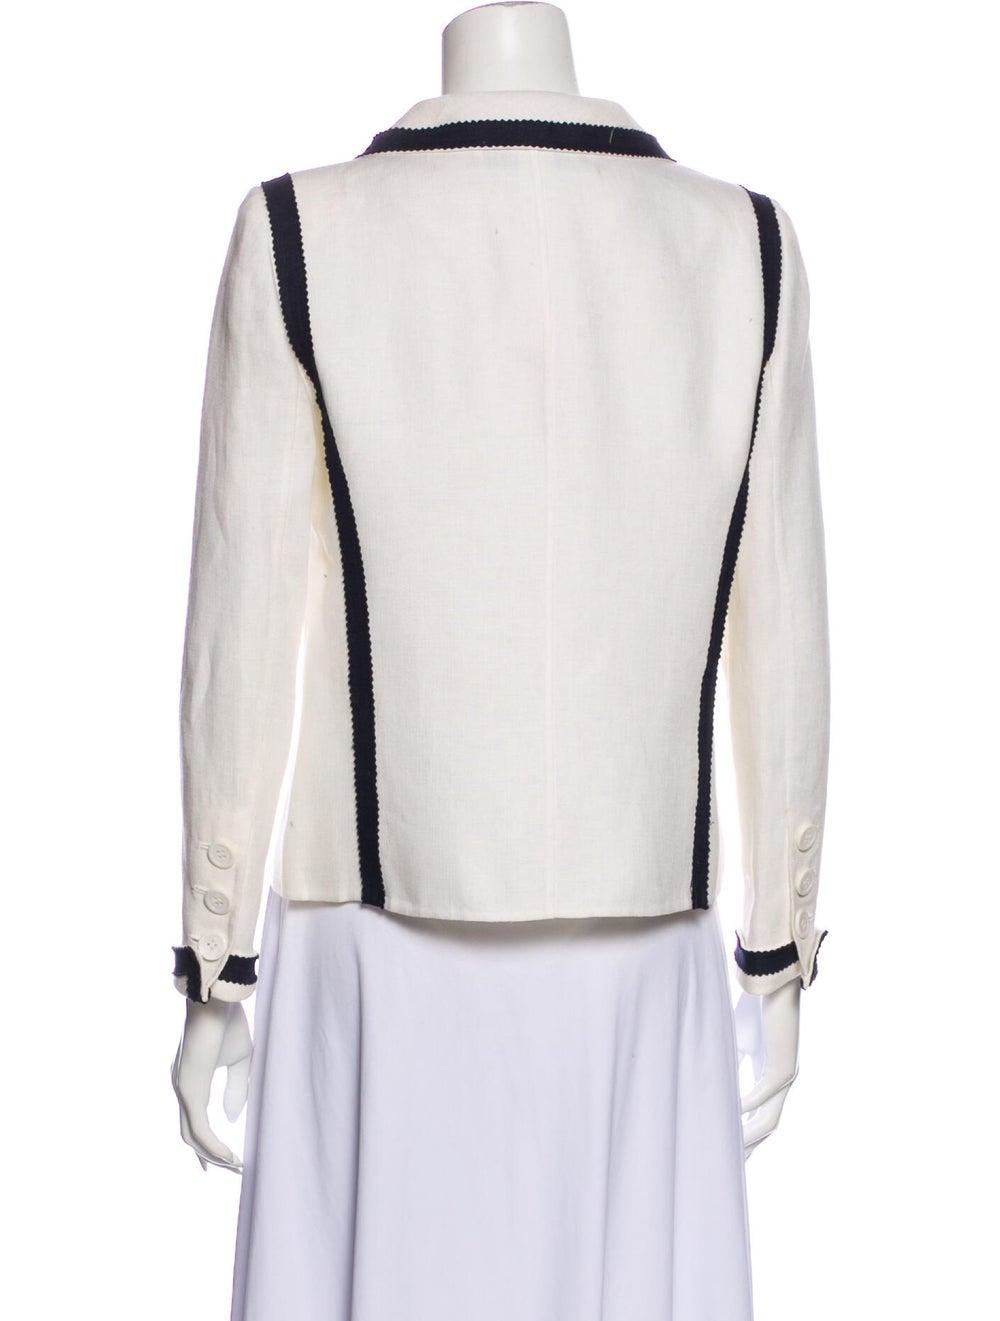 Oscar de la Renta Linen Jacket White - image 3